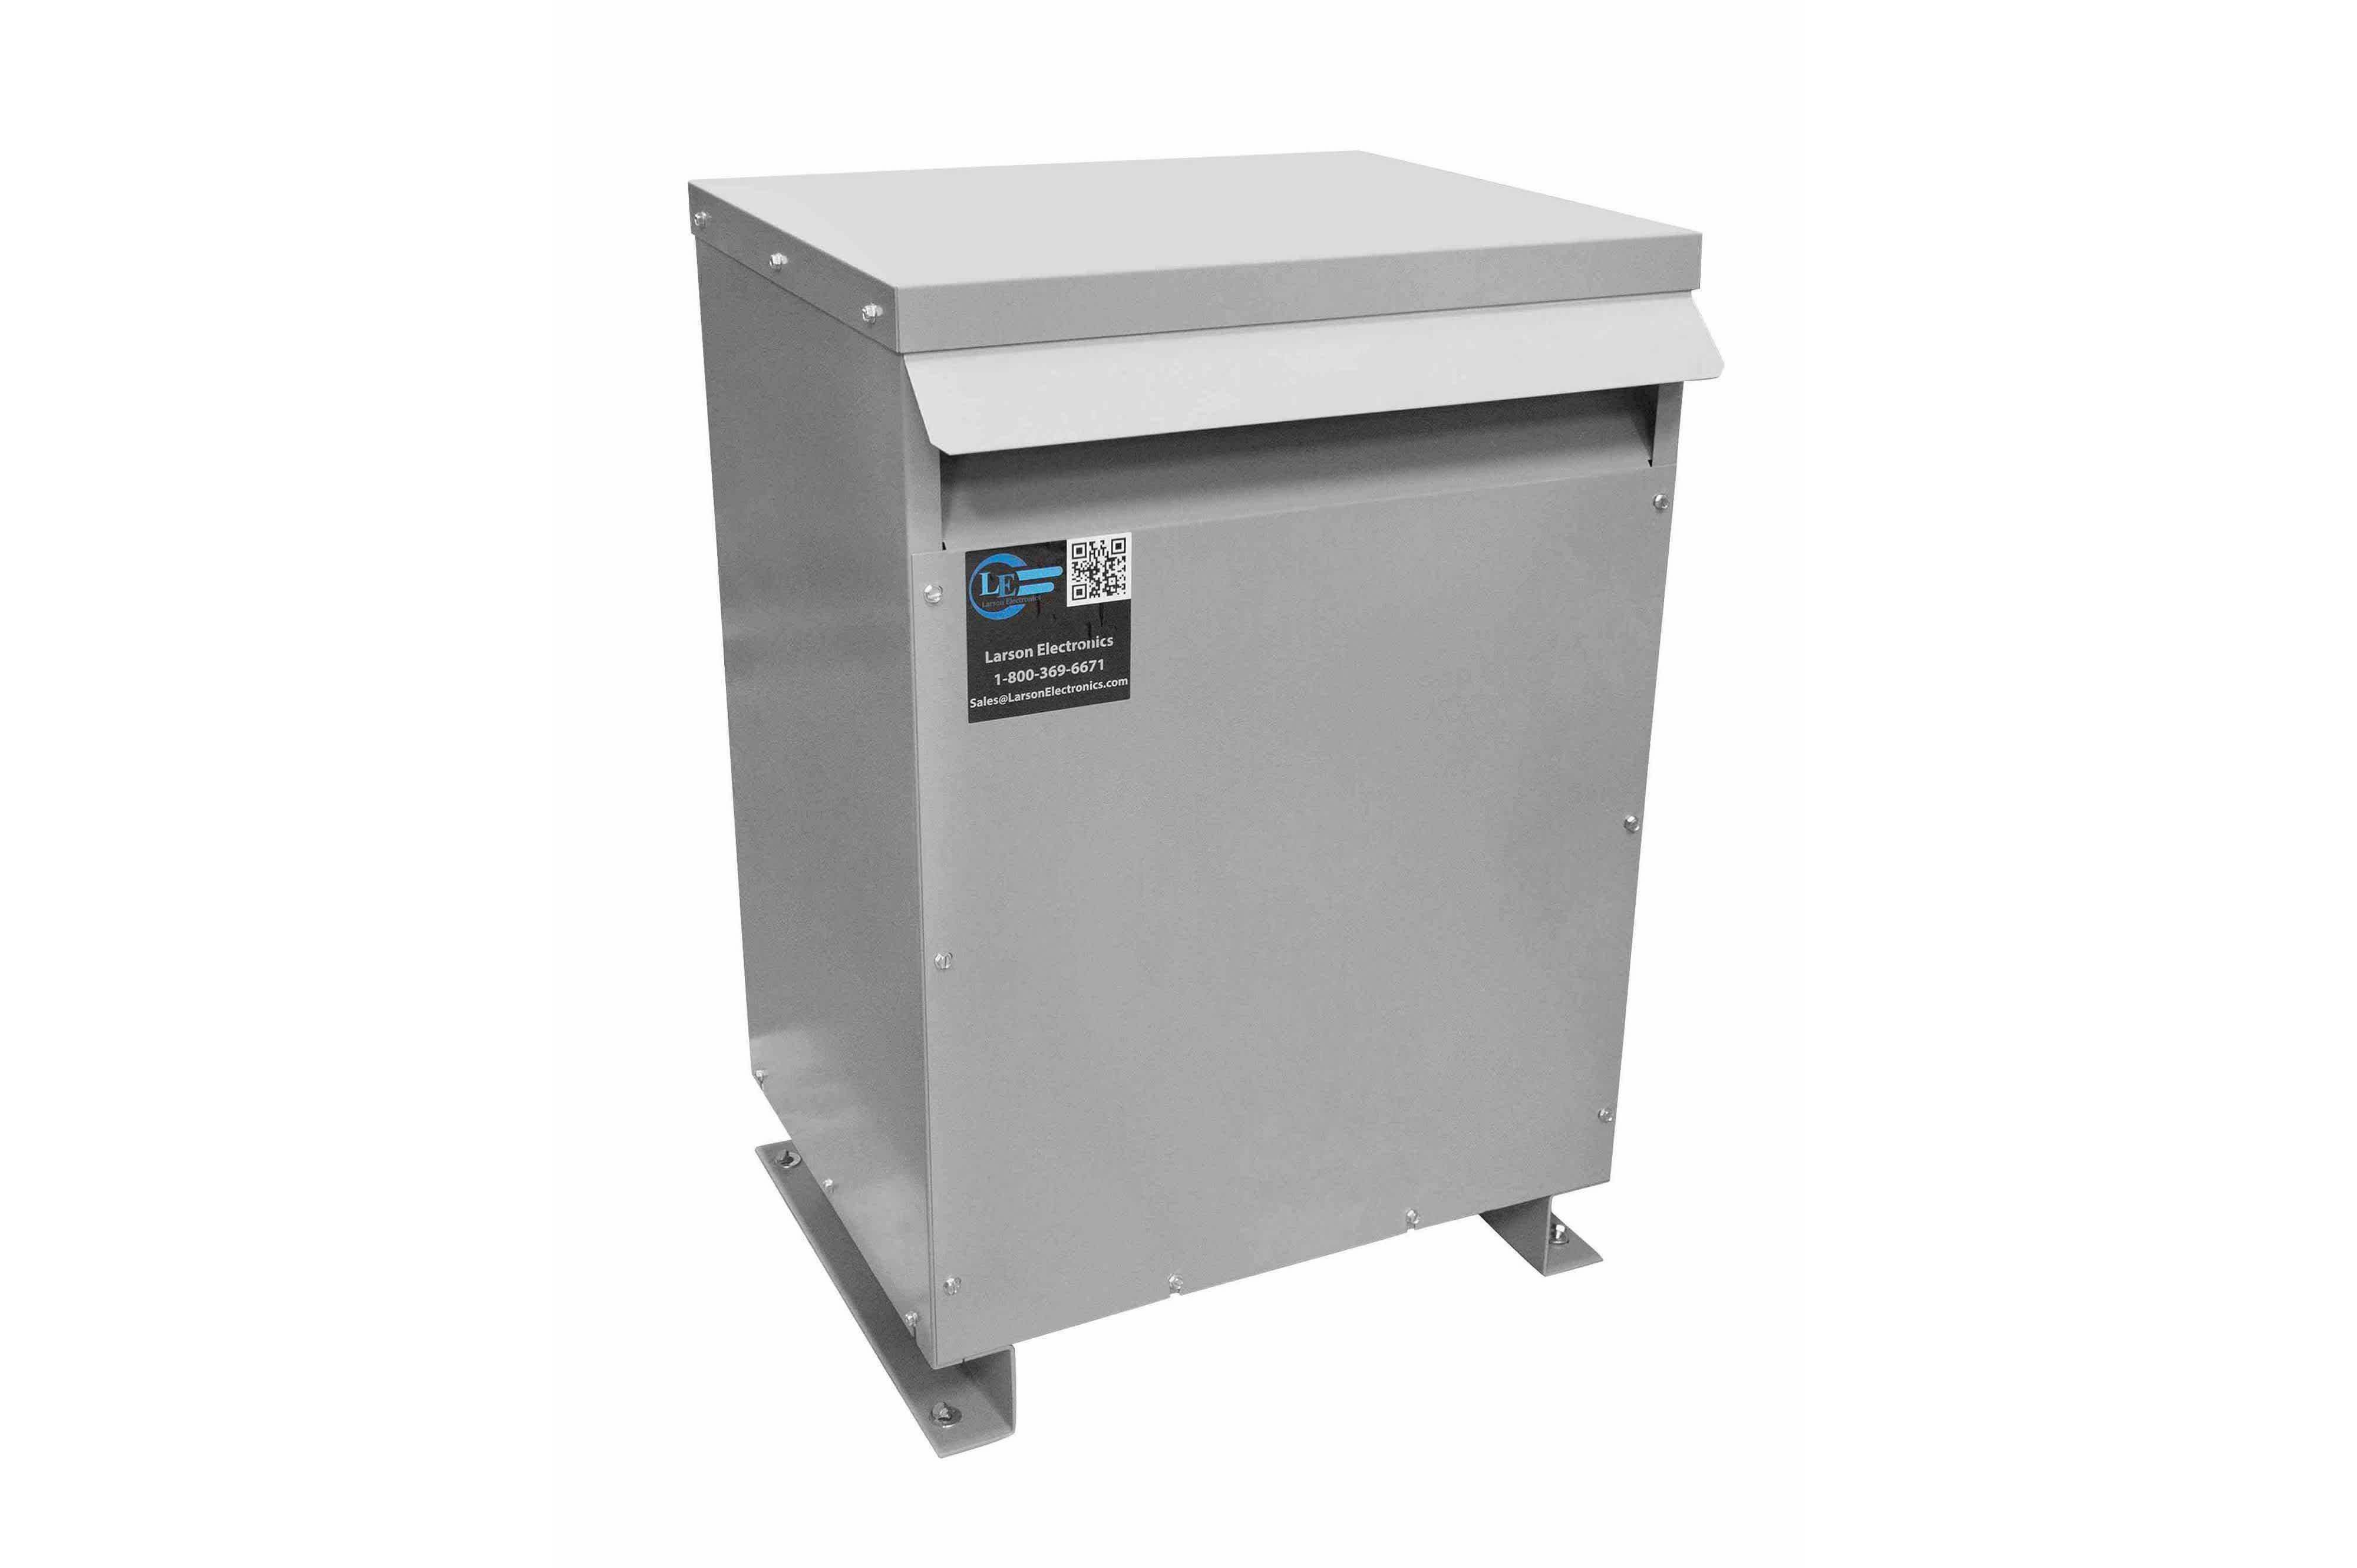 125 kVA 3PH Isolation Transformer, 415V Wye Primary, 600V Delta Secondary, N3R, Ventilated, 60 Hz